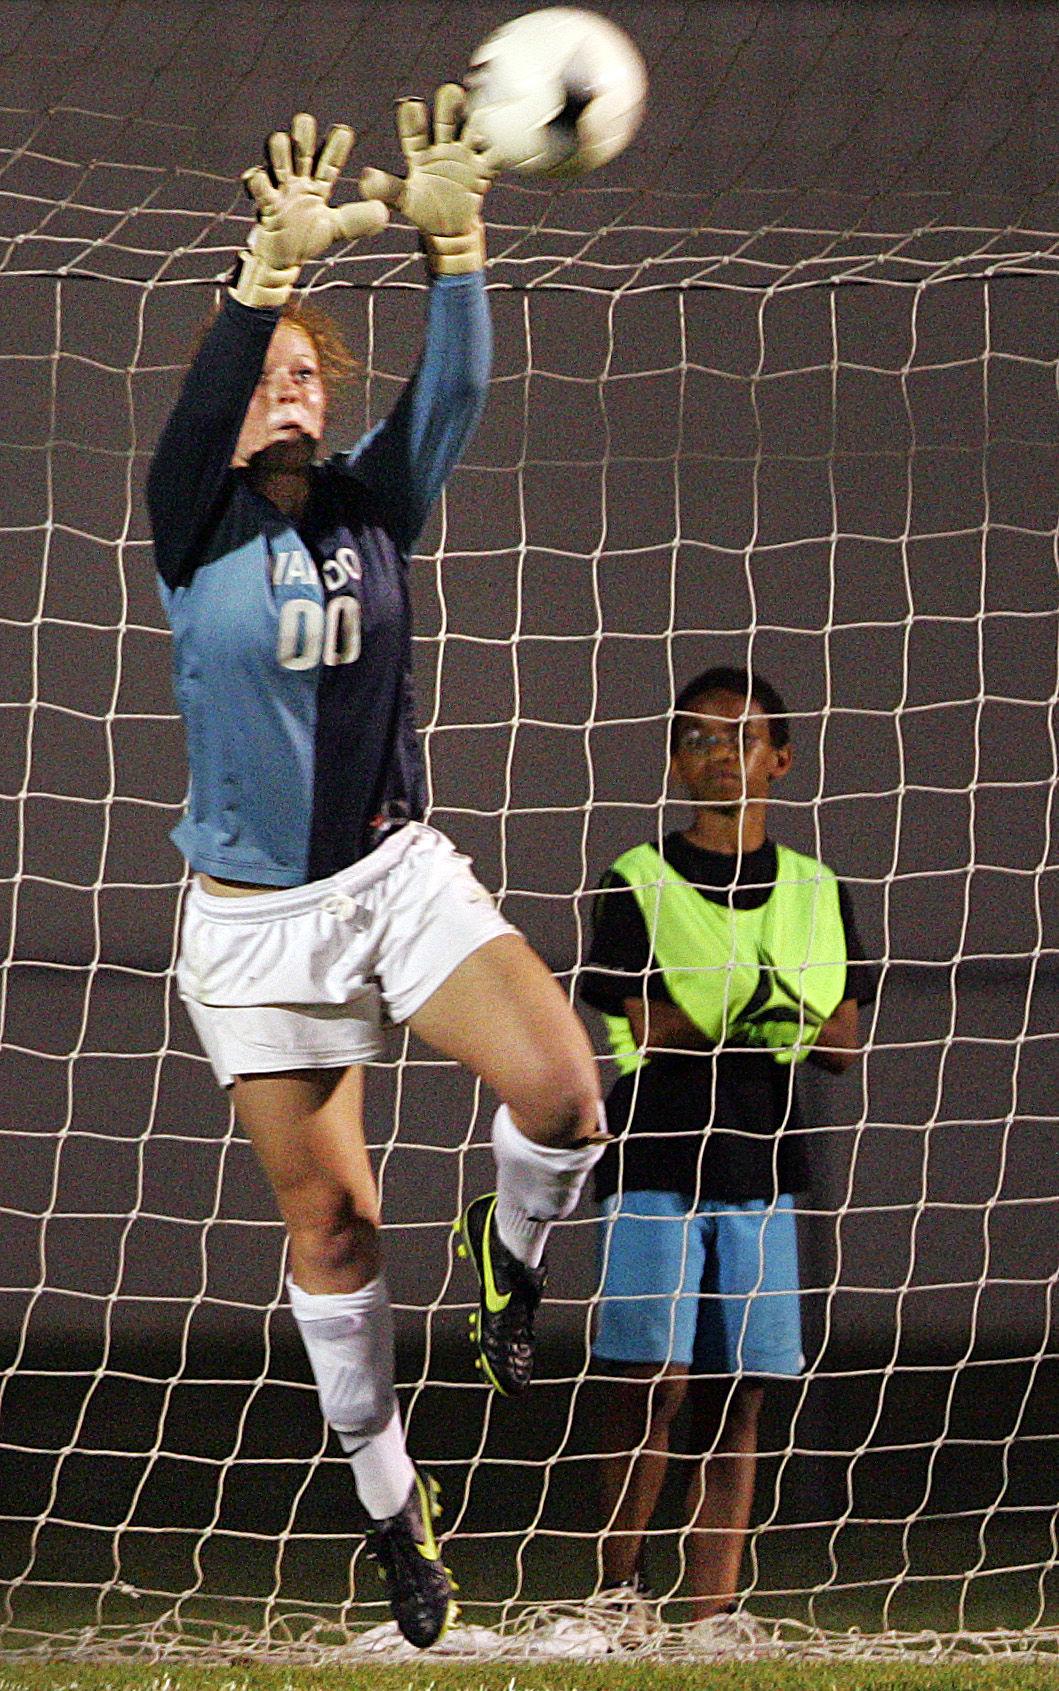 Wando tops Mauldin for 4A Soccer Championship